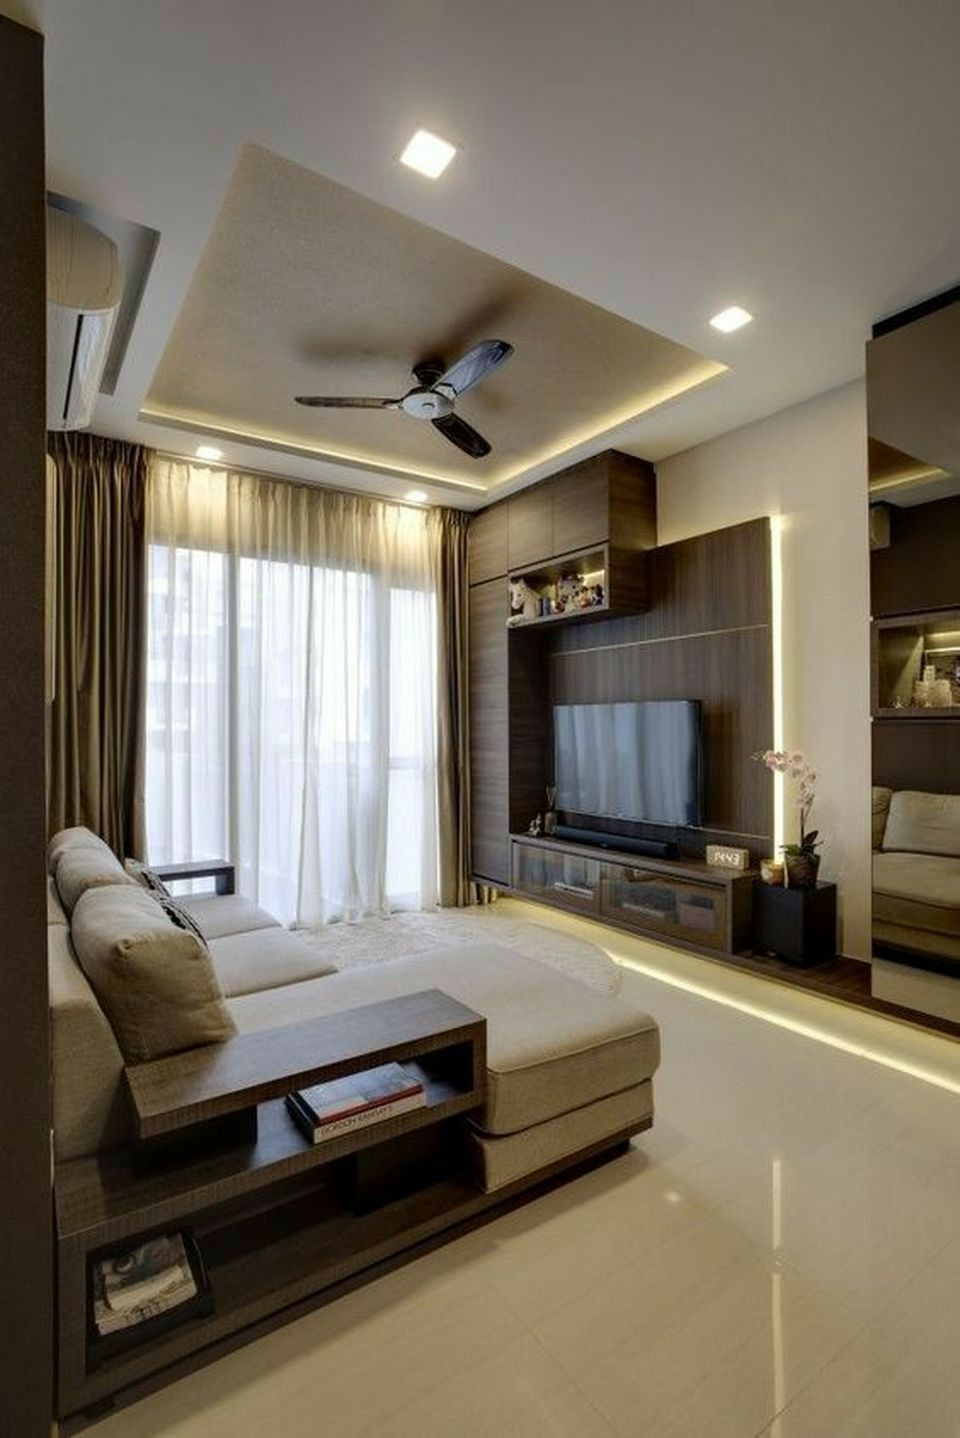 The Sofa Project Condominium Interior Design Condo Interior